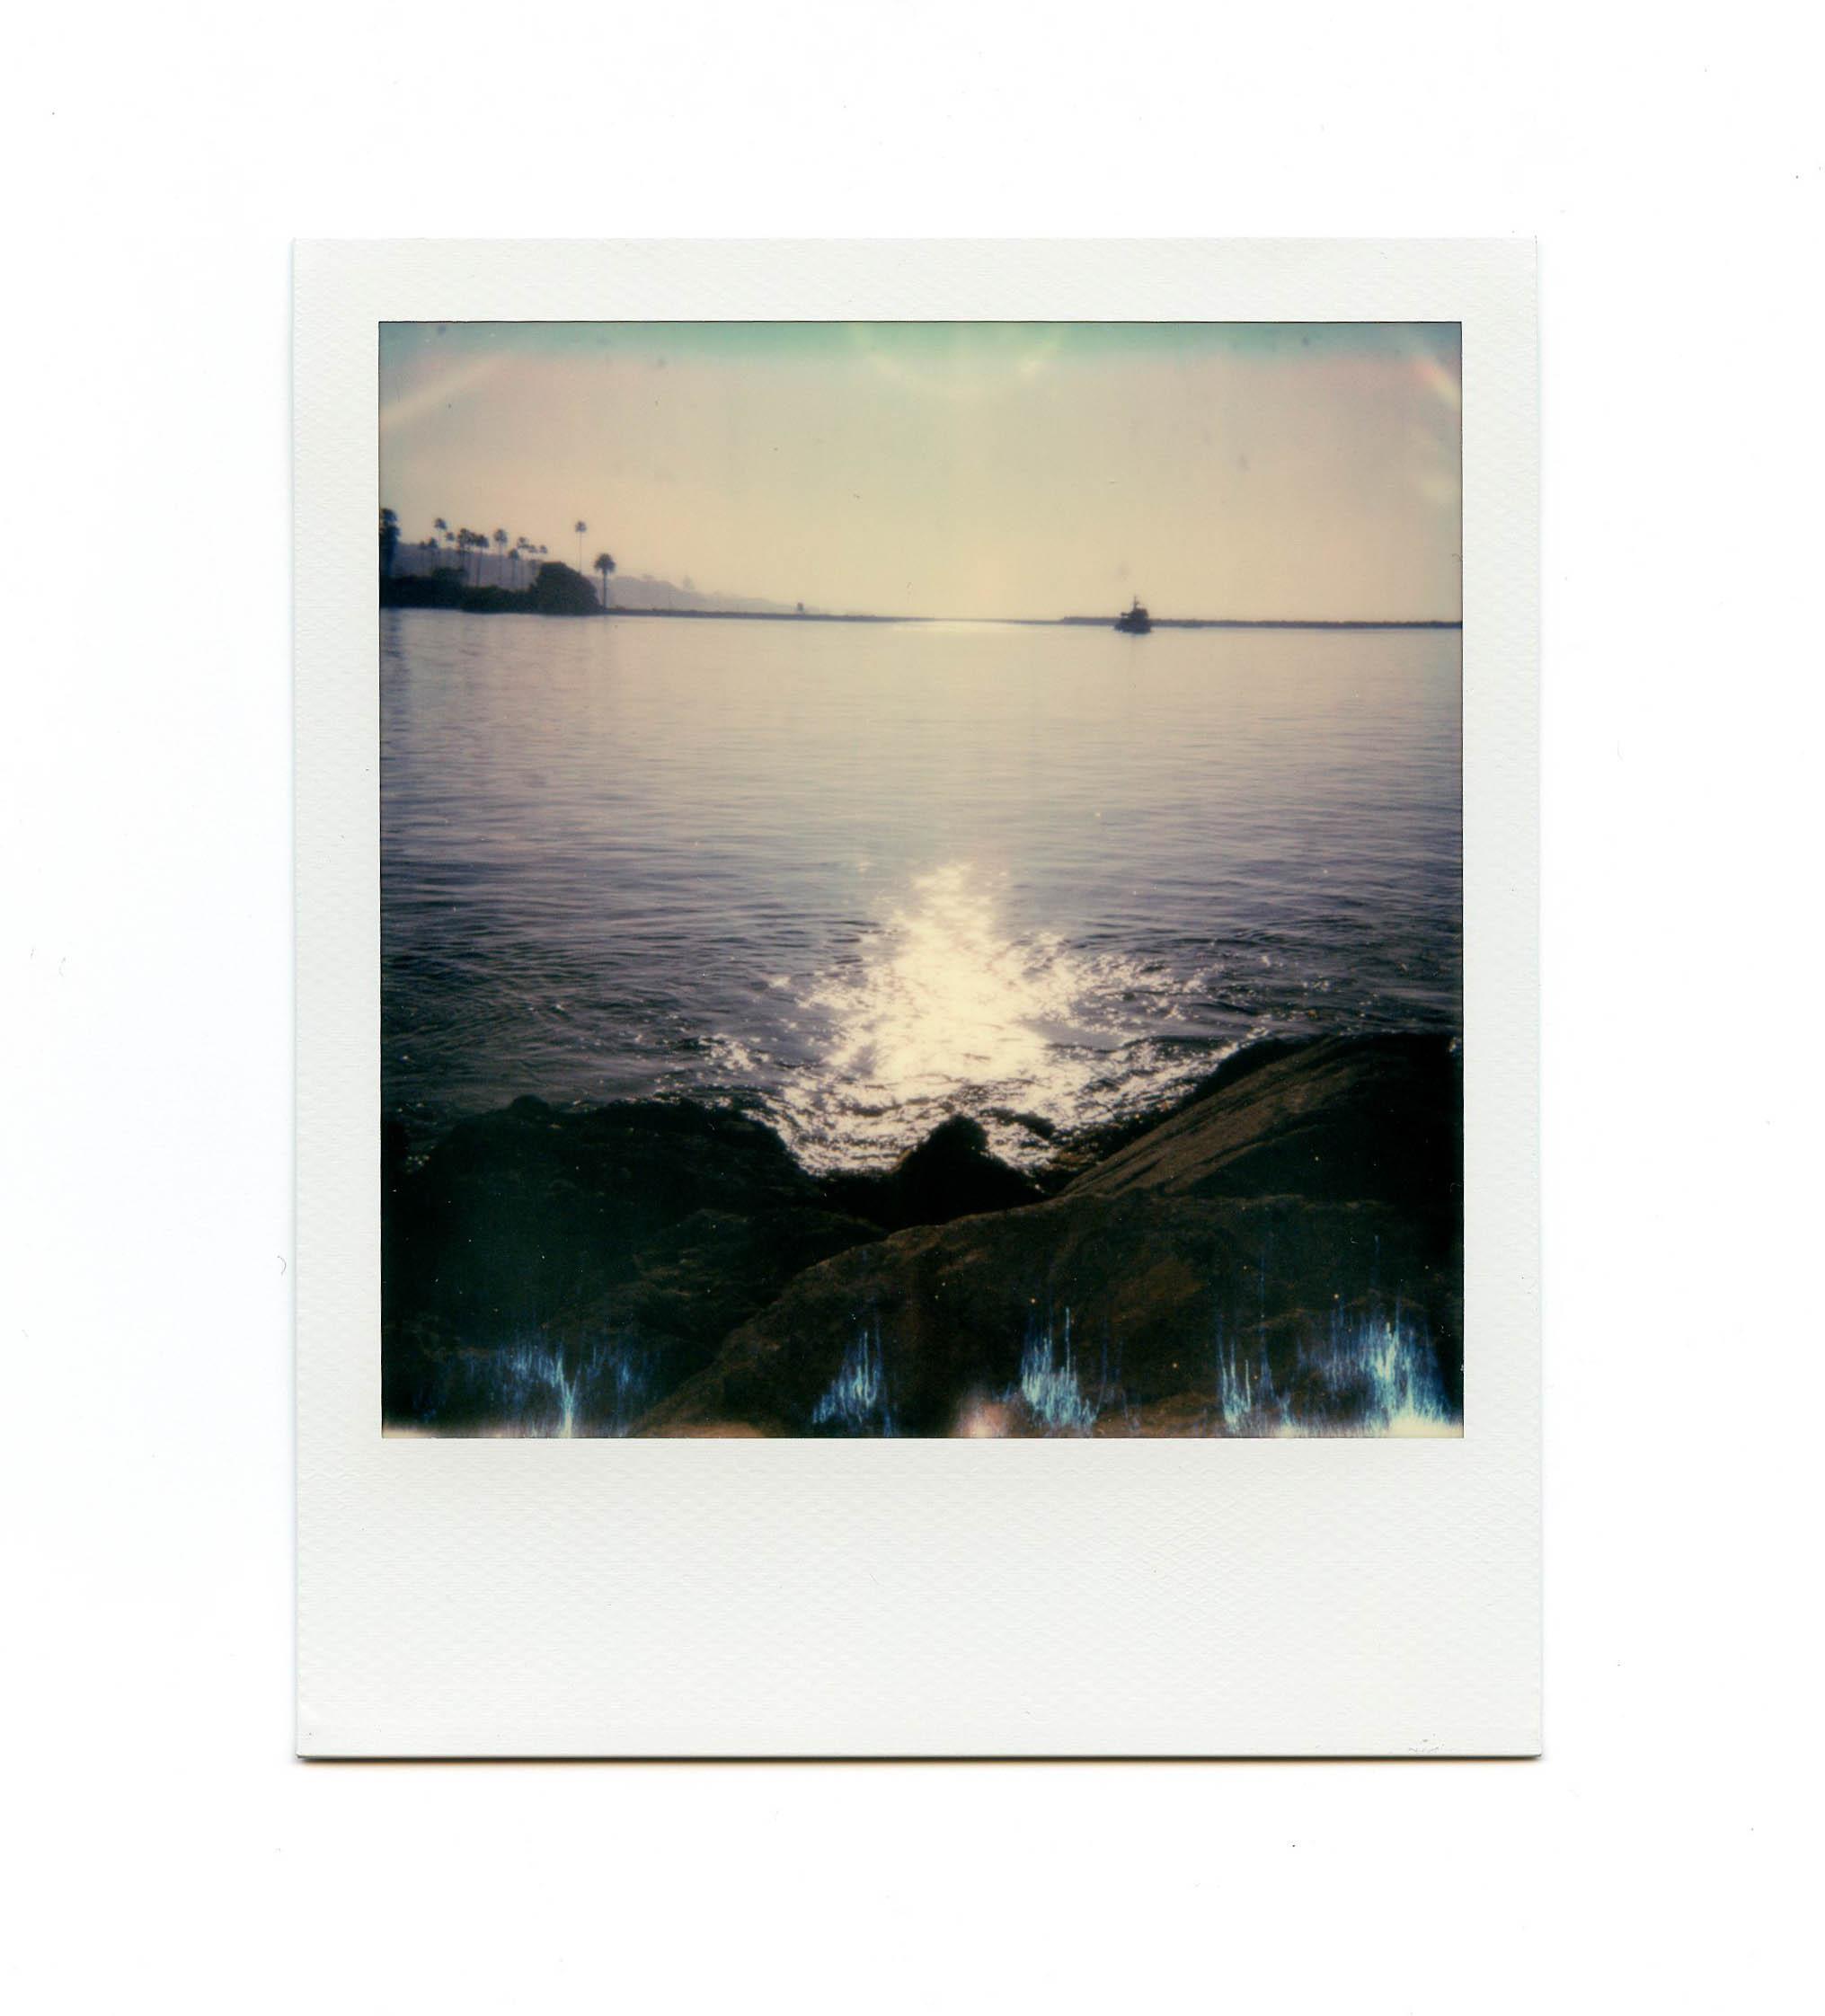 7 Polaroid Sun 600 Instant Film Camera Review - FilterGrade